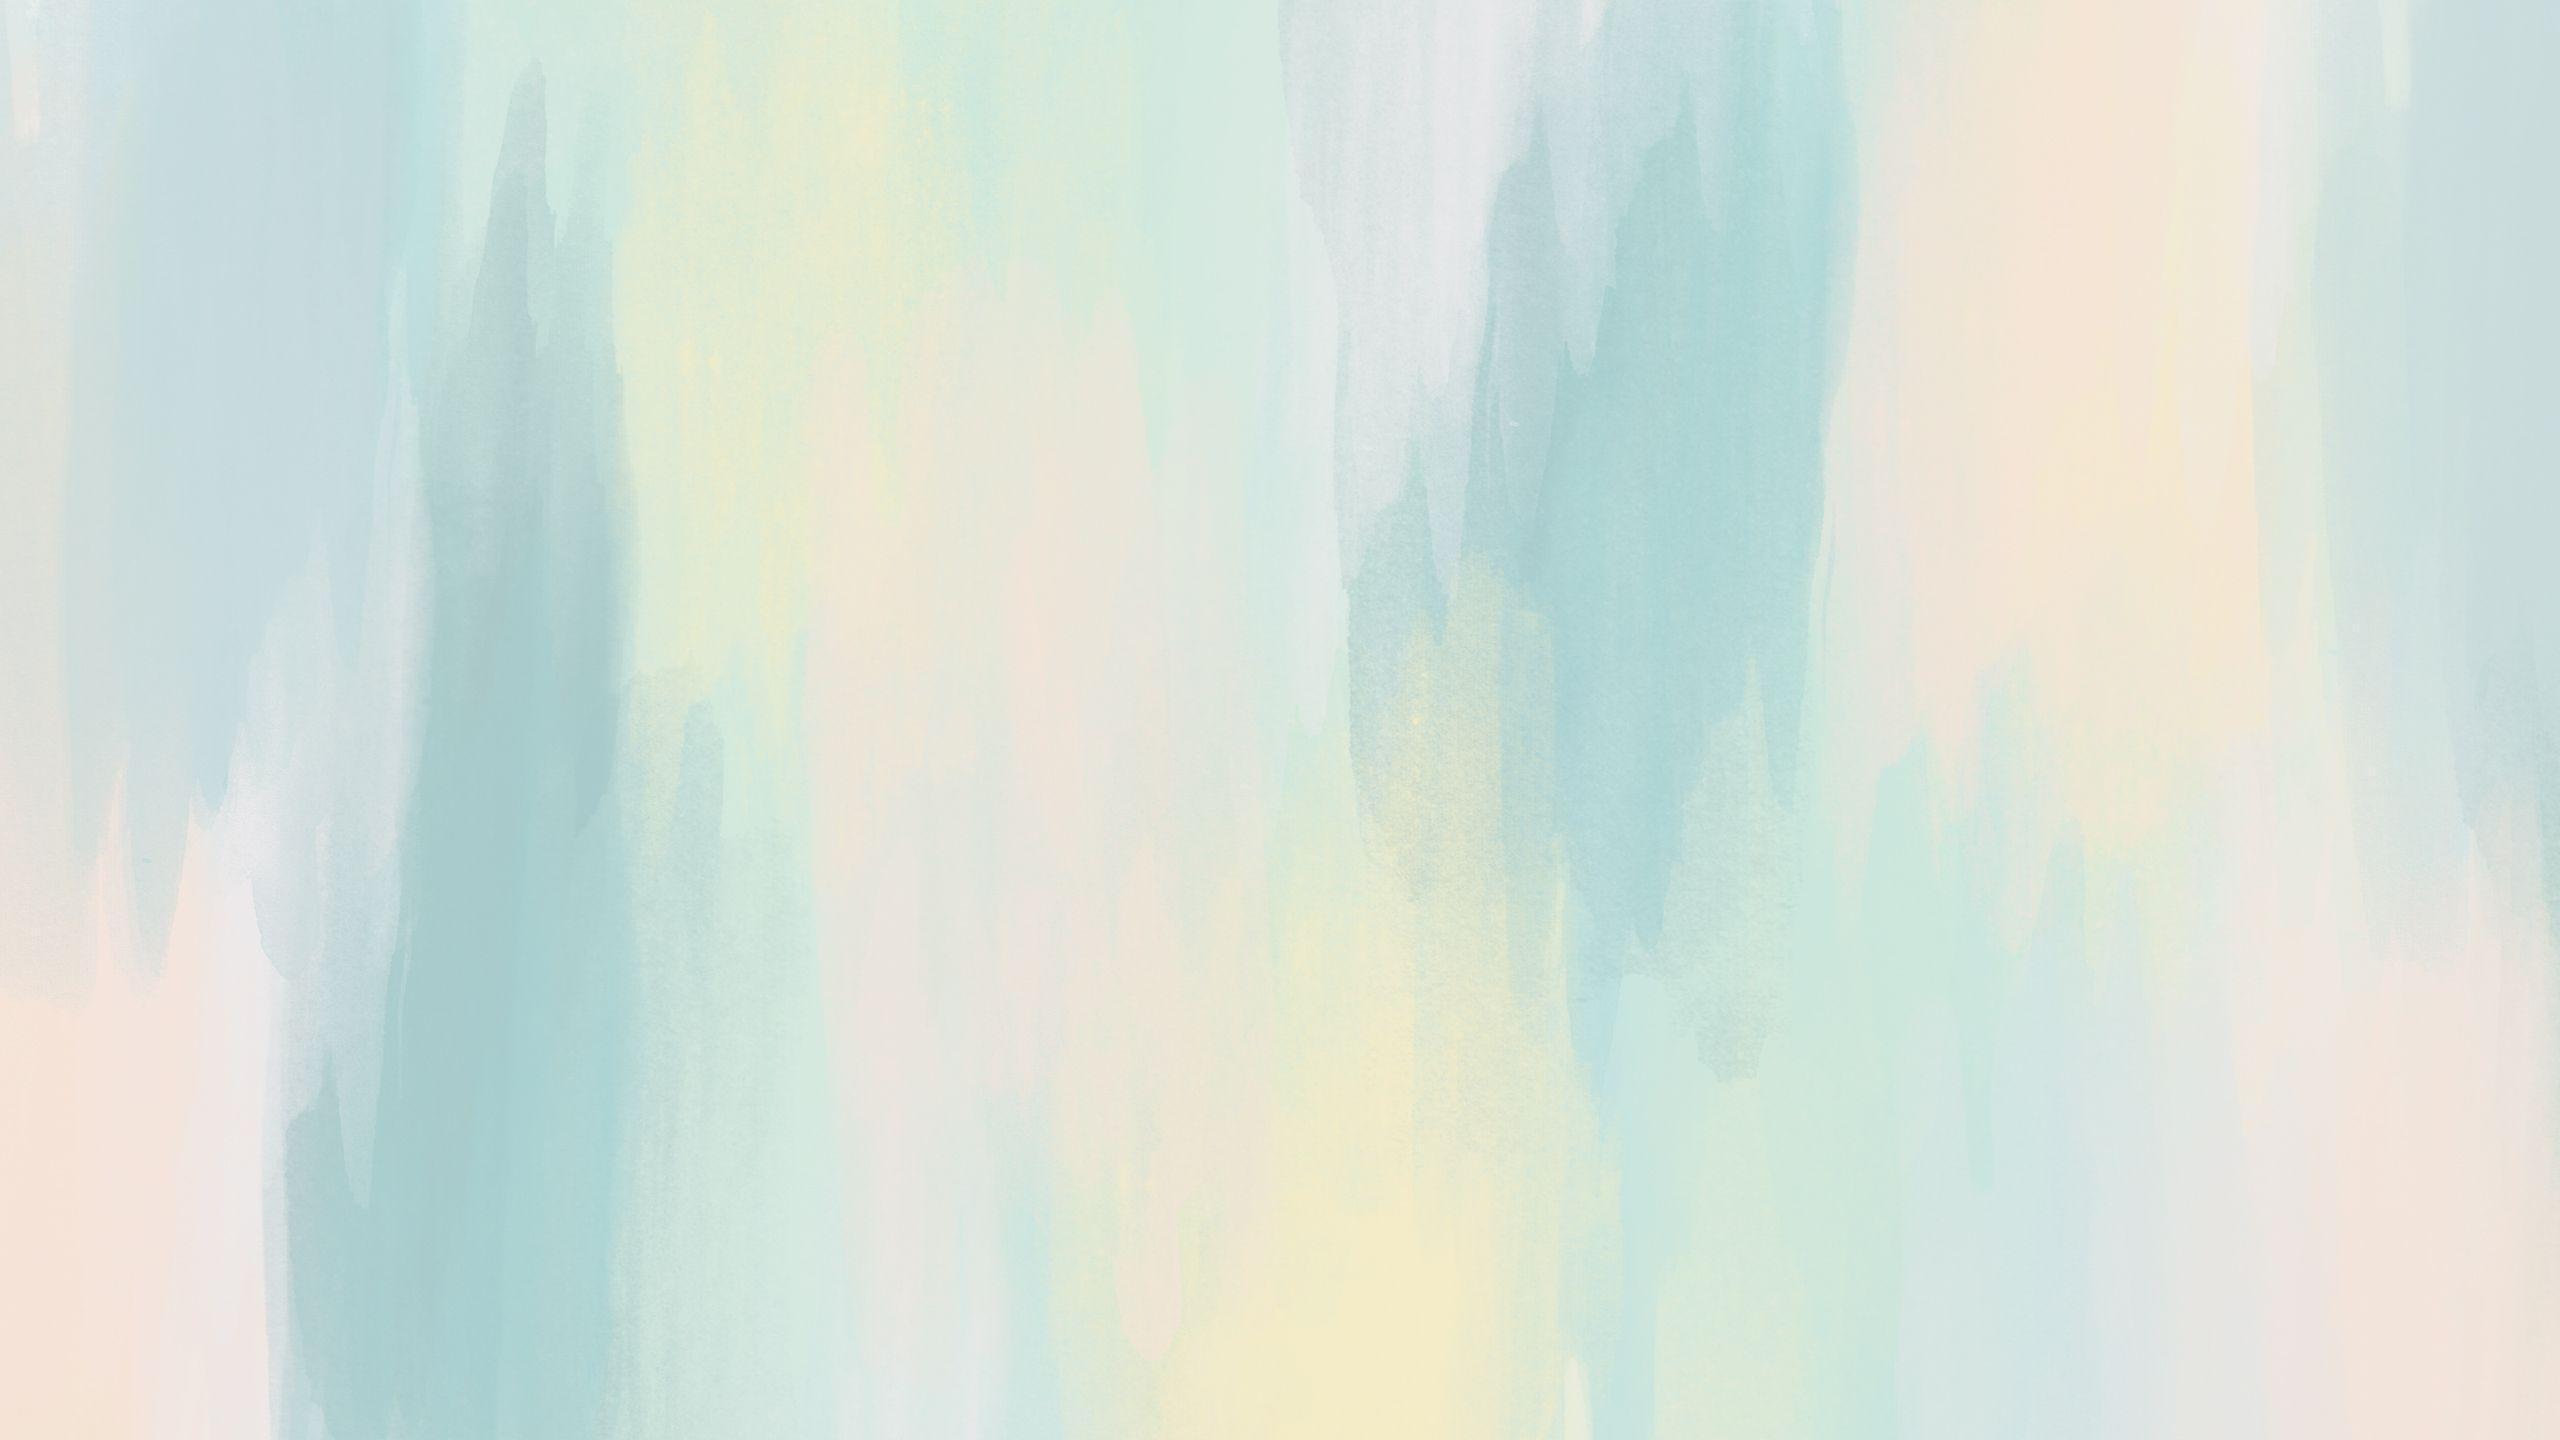 Pastel Desktop Wallpapers Top Free Pastel Desktop Backgrounds Wallpaperaccess